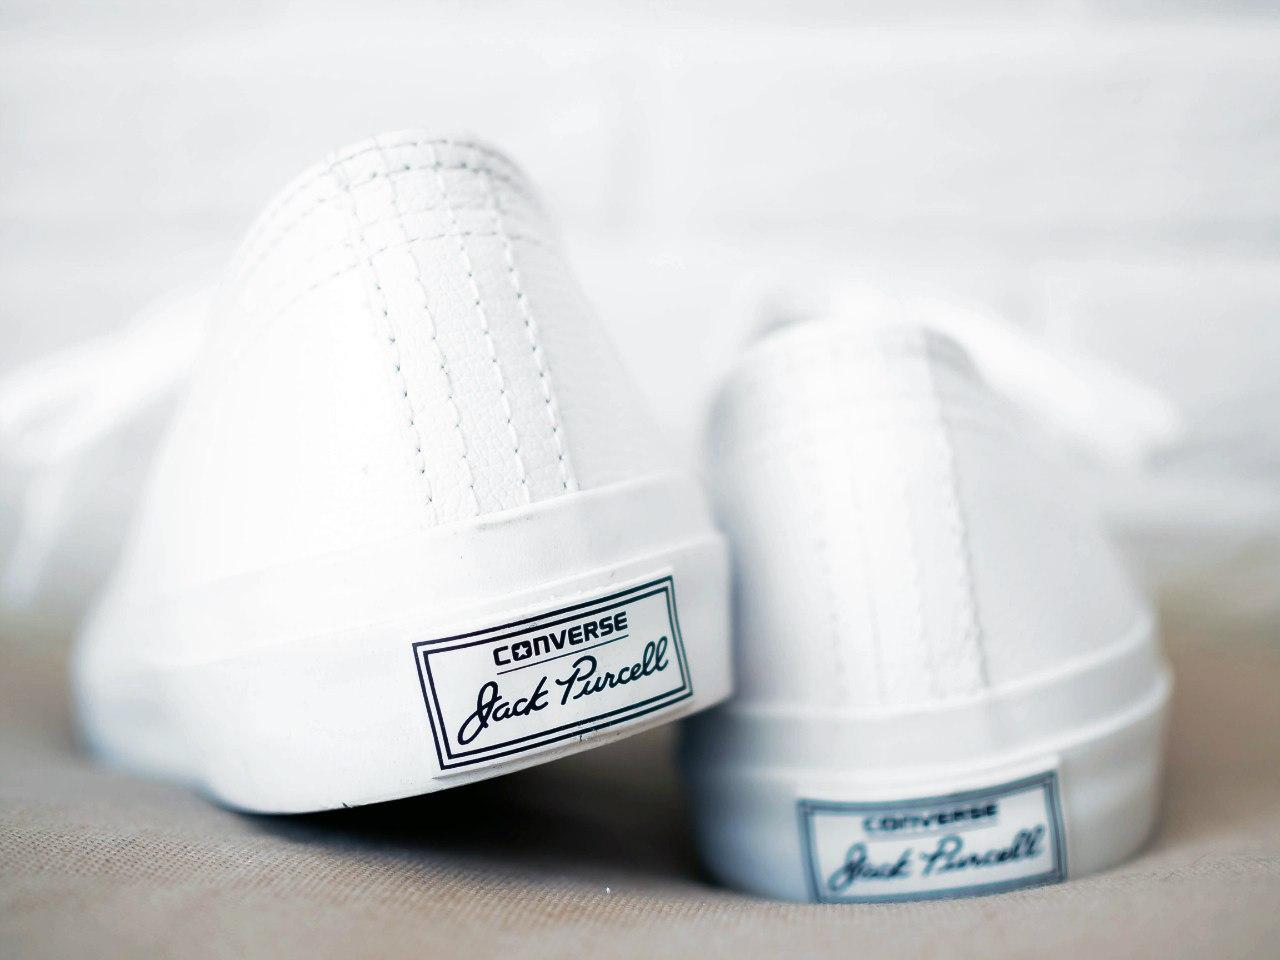 Белые конверсы Converse